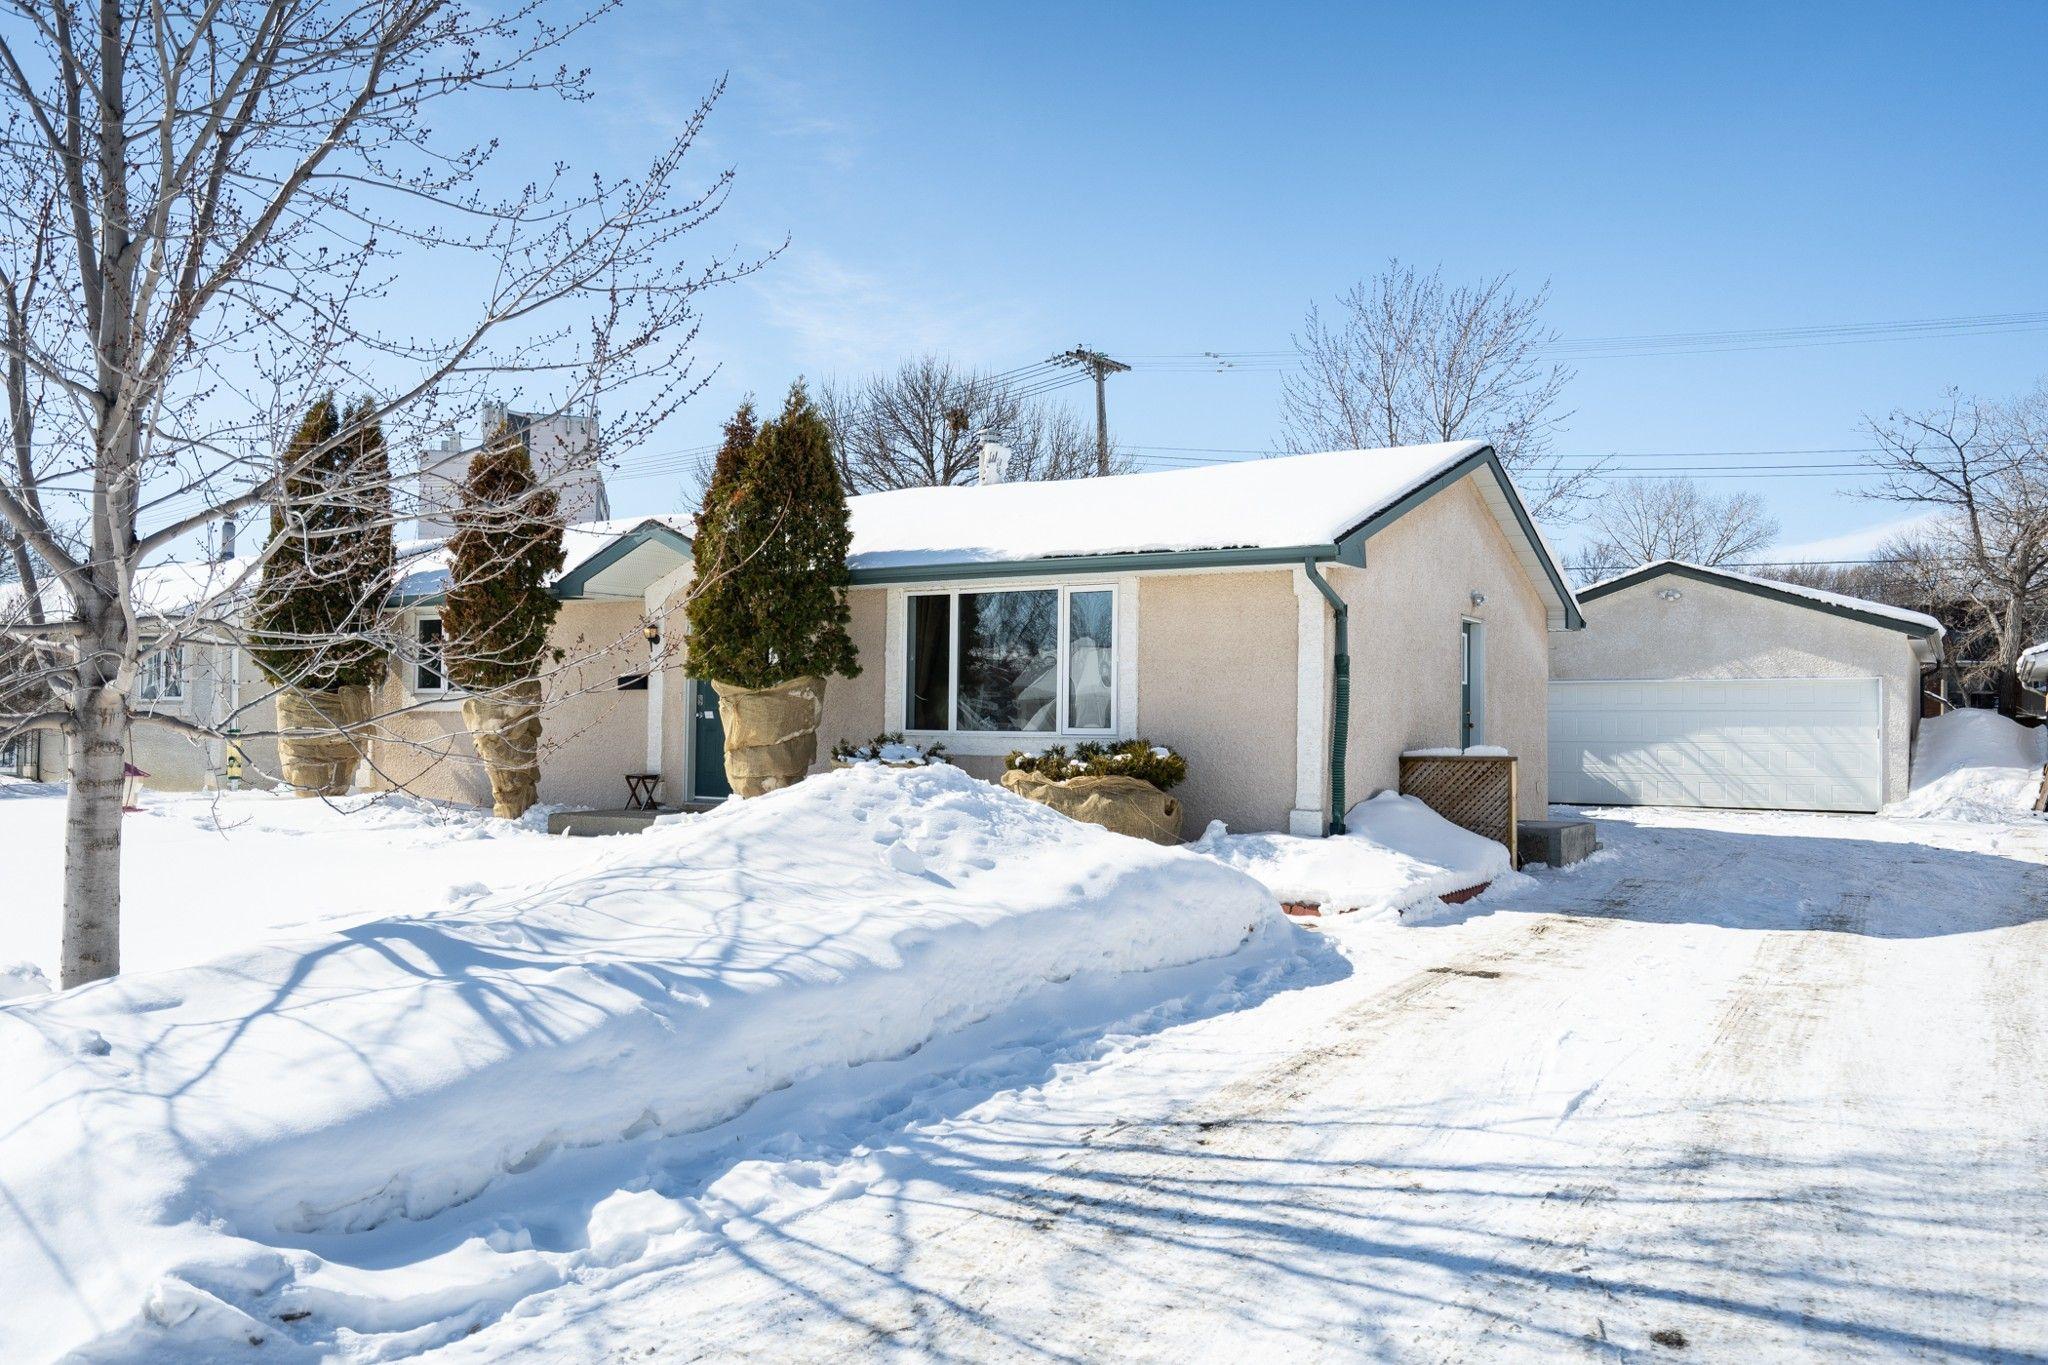 Main Photo: 134 Braintree Crescent in Winnipeg: Jameswood House for sale (5F)  : MLS®# 1905333